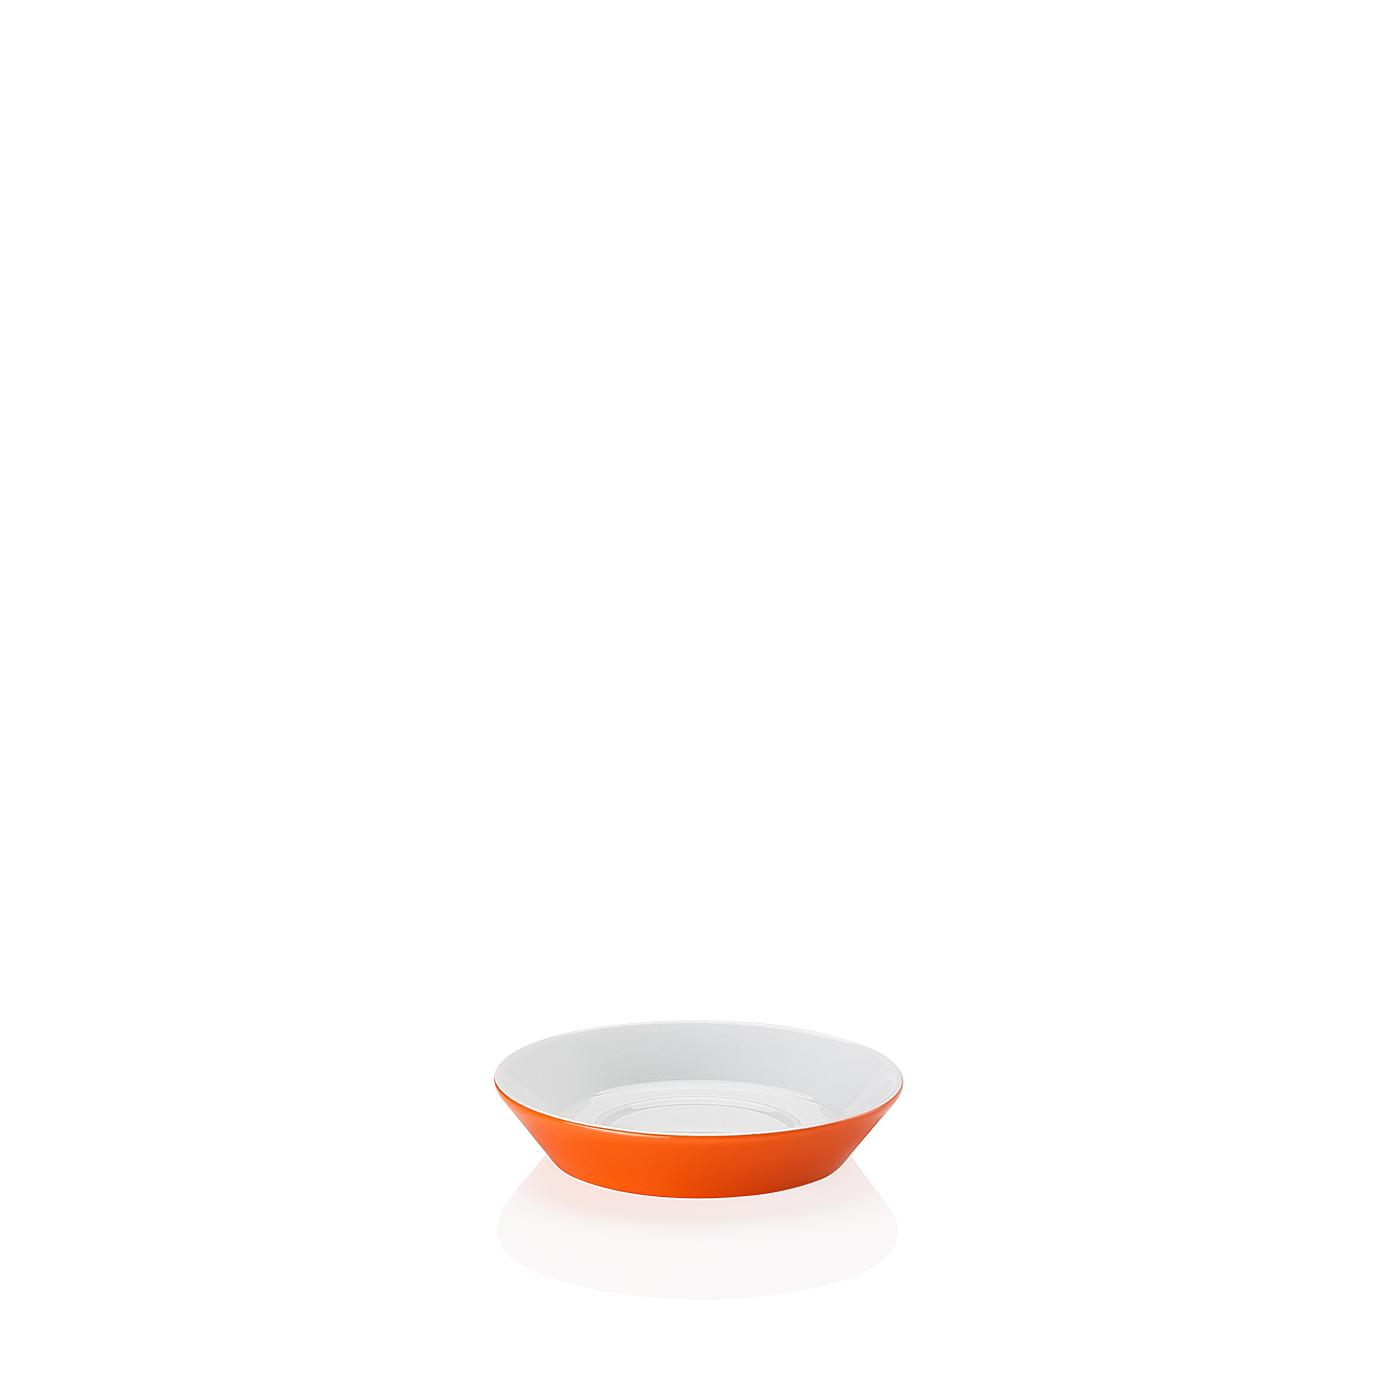 Espresso-/Mokka-Untertasse Tric Fresh Arzberg